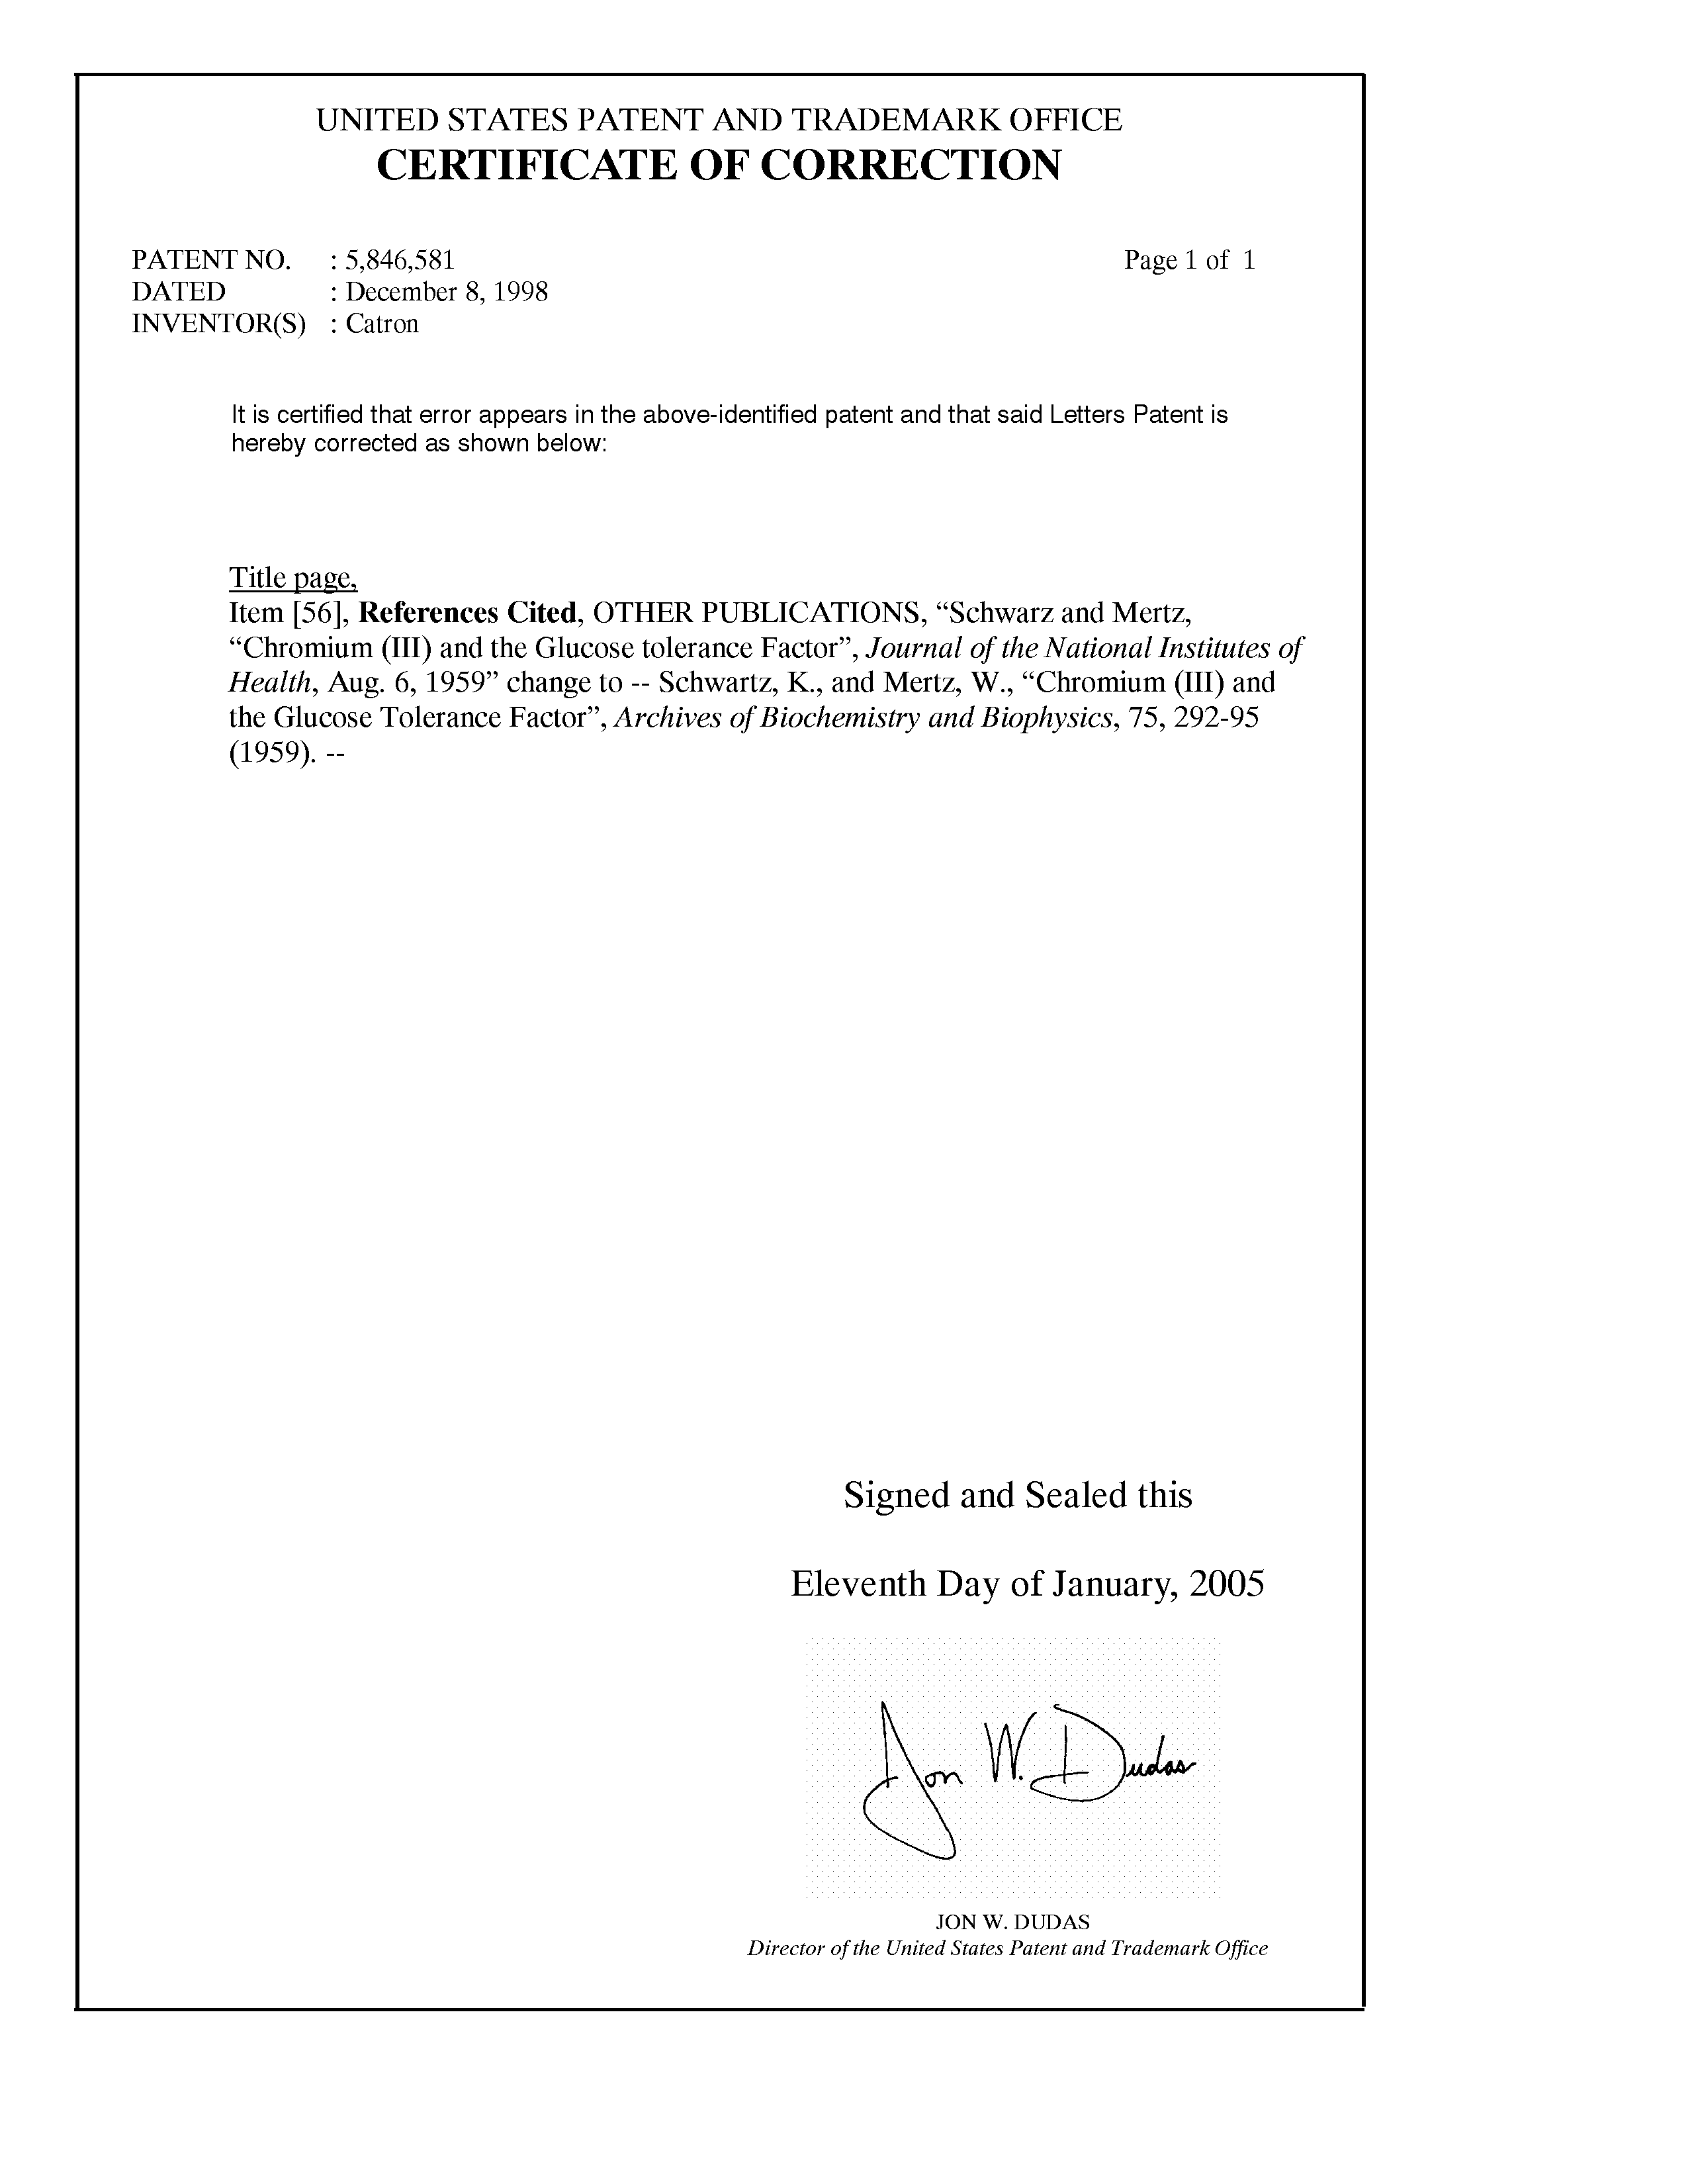 Us 5846581 A Chromium Iii Salts Of Short Chain Fatty Acids